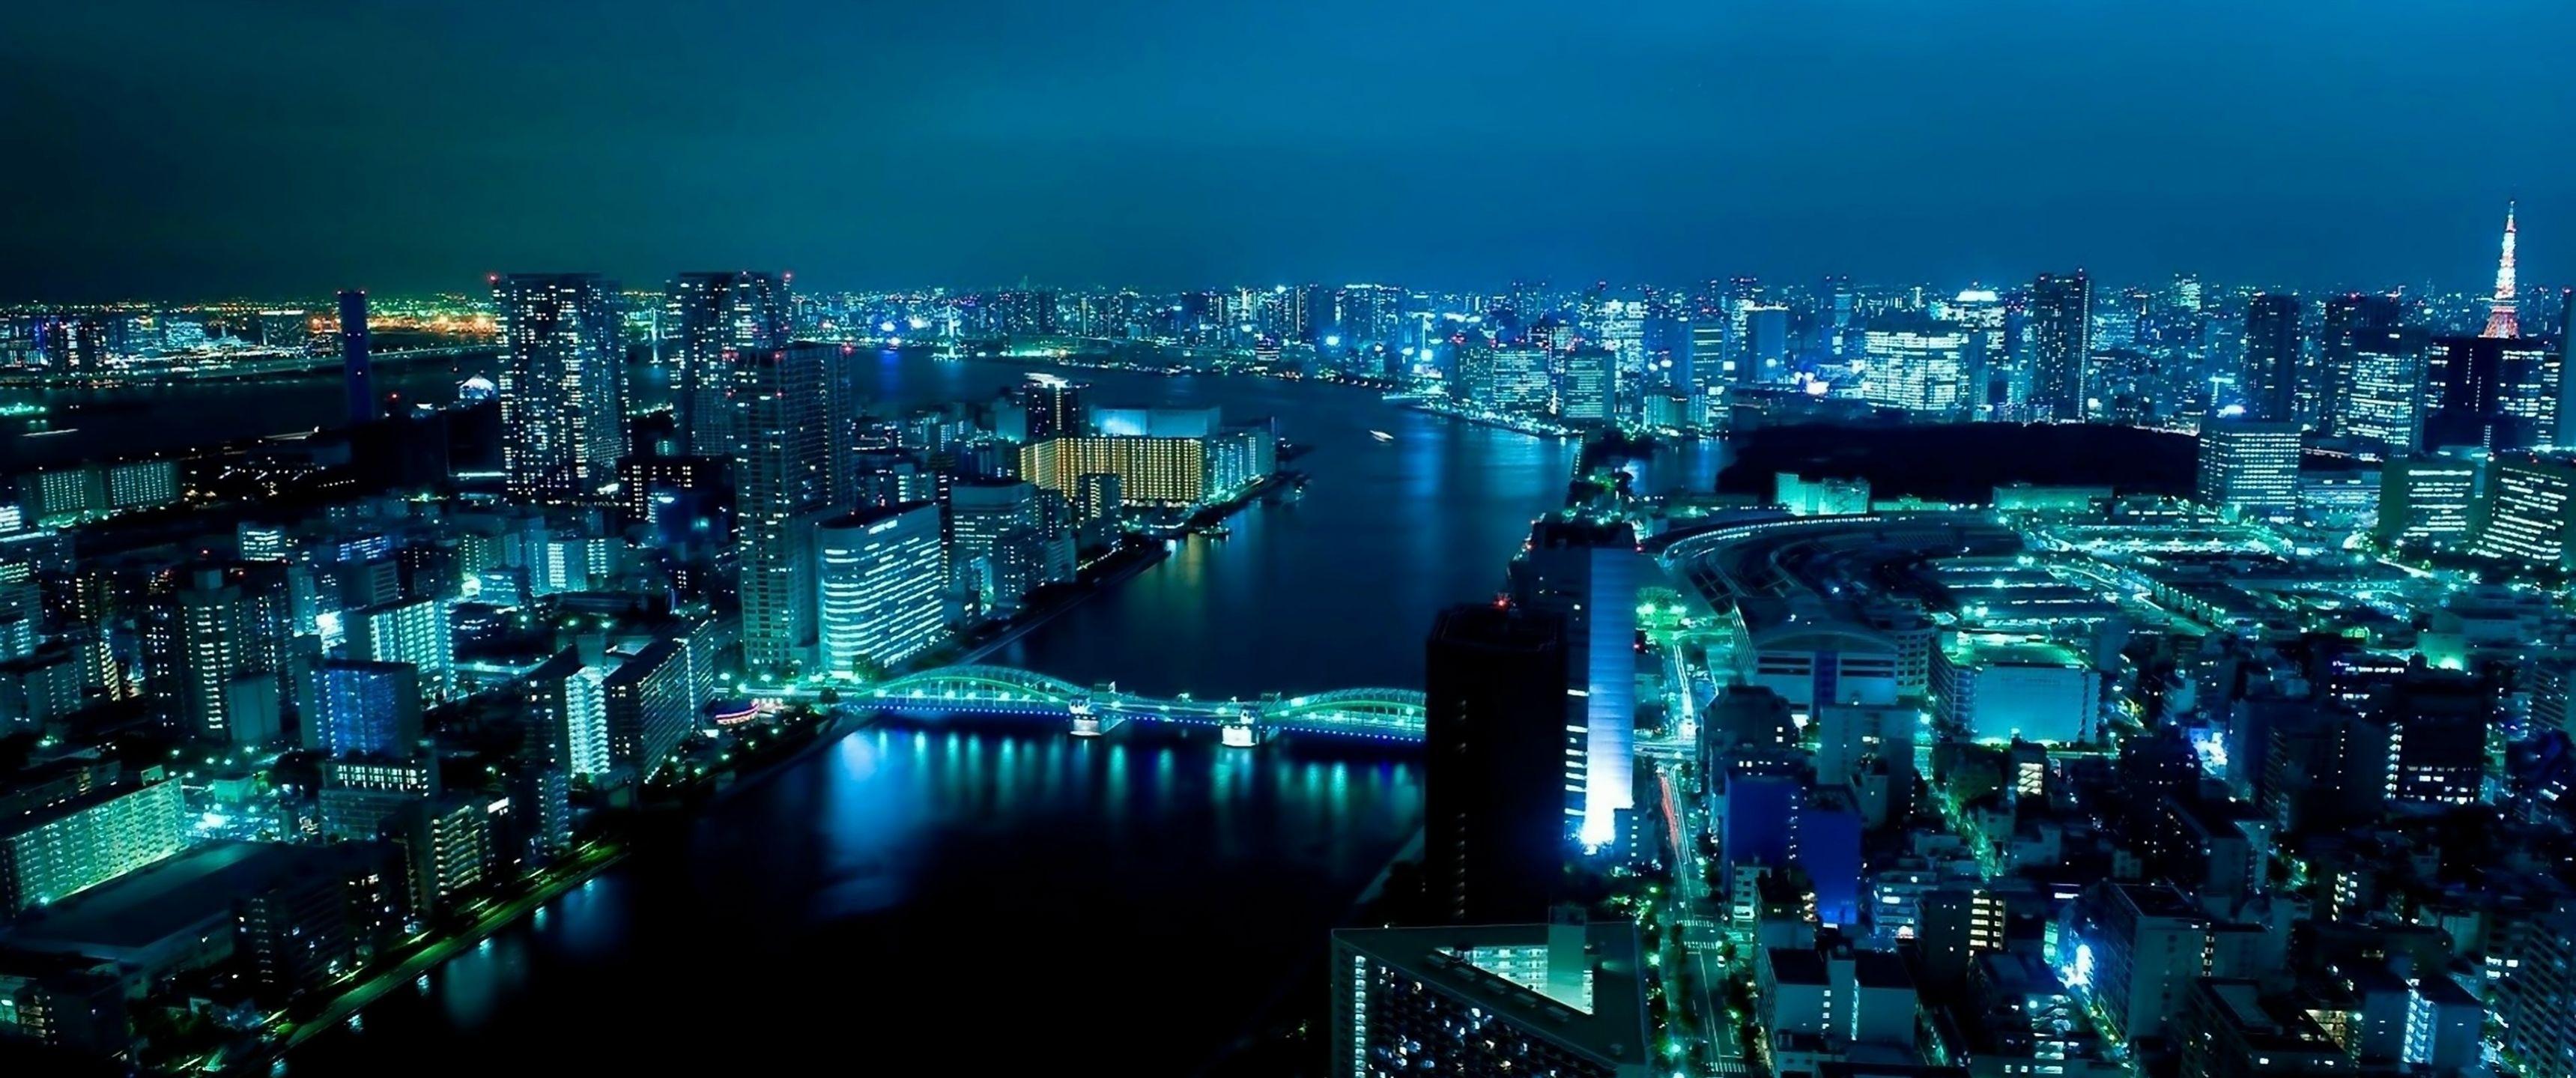 Tokyo City Lights at Night Download 3439x1439